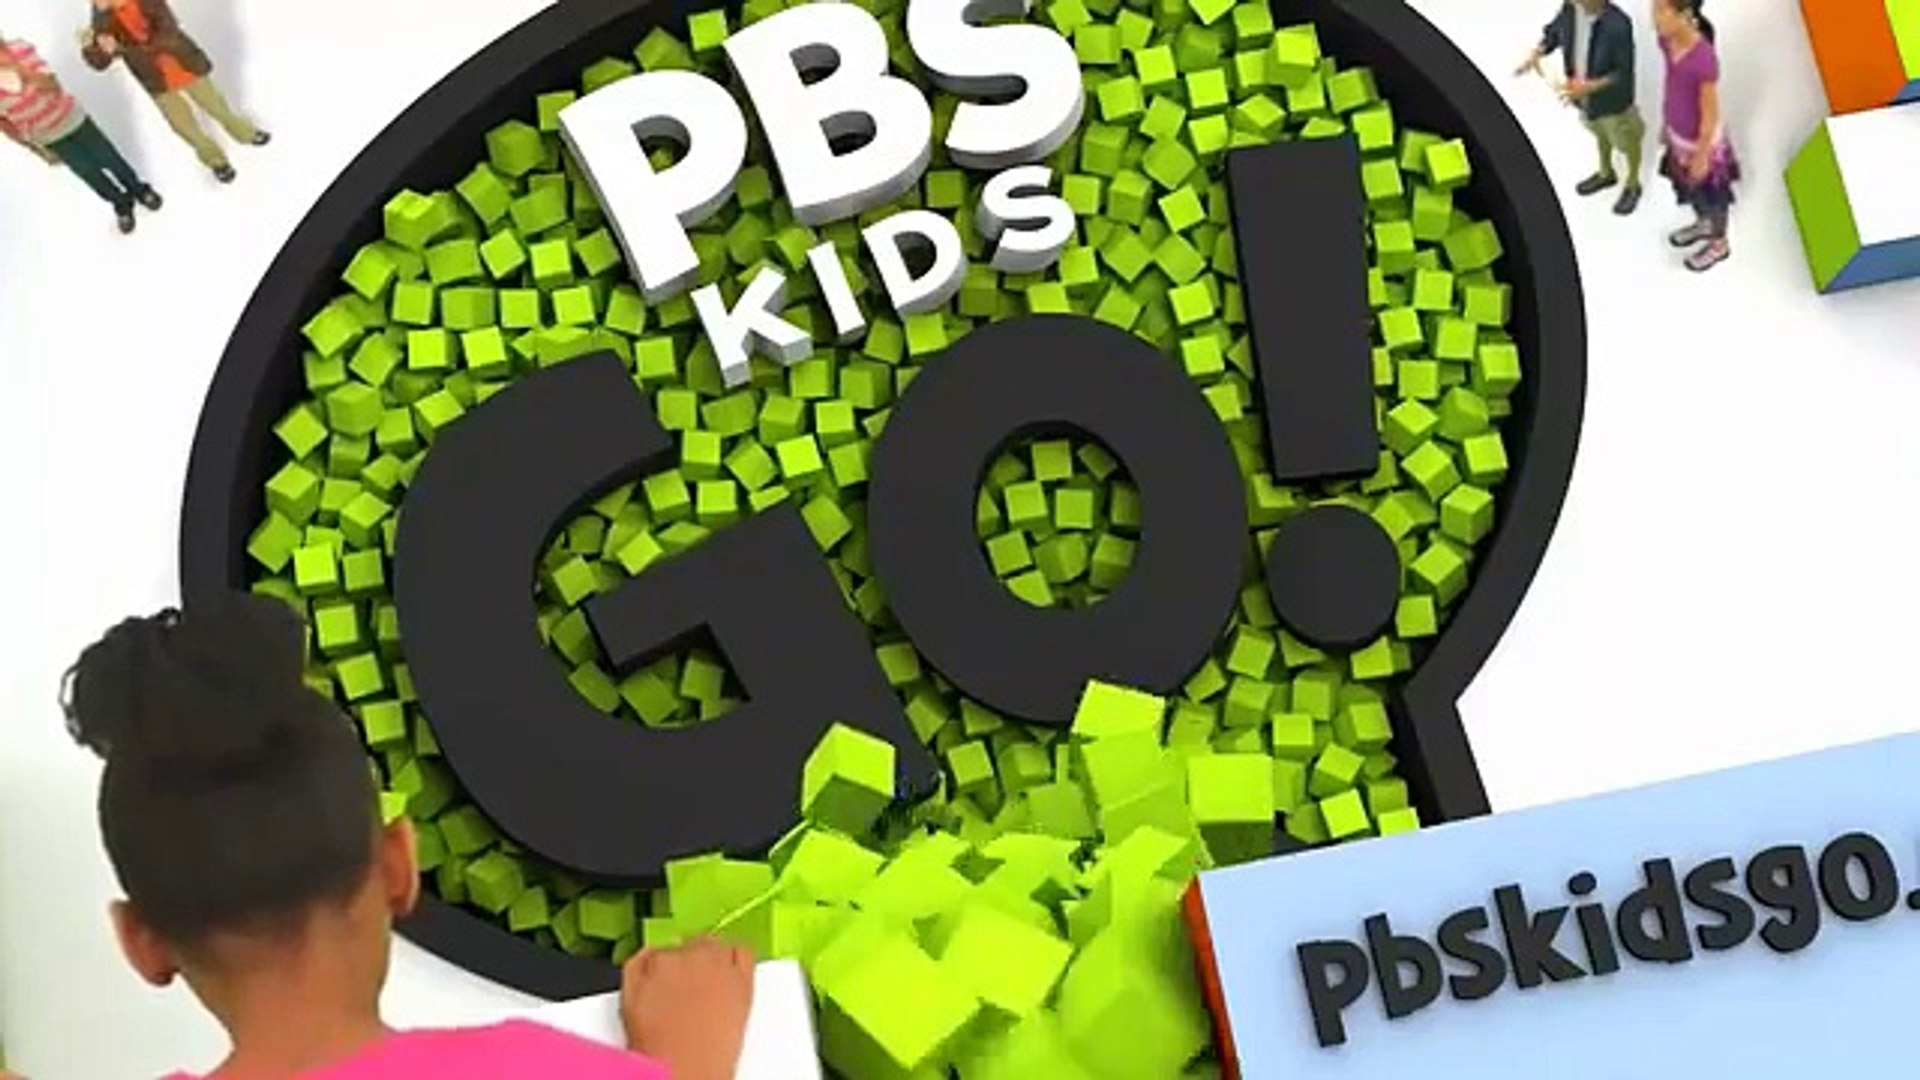 PBS Kids GO! Montage Primal Screen